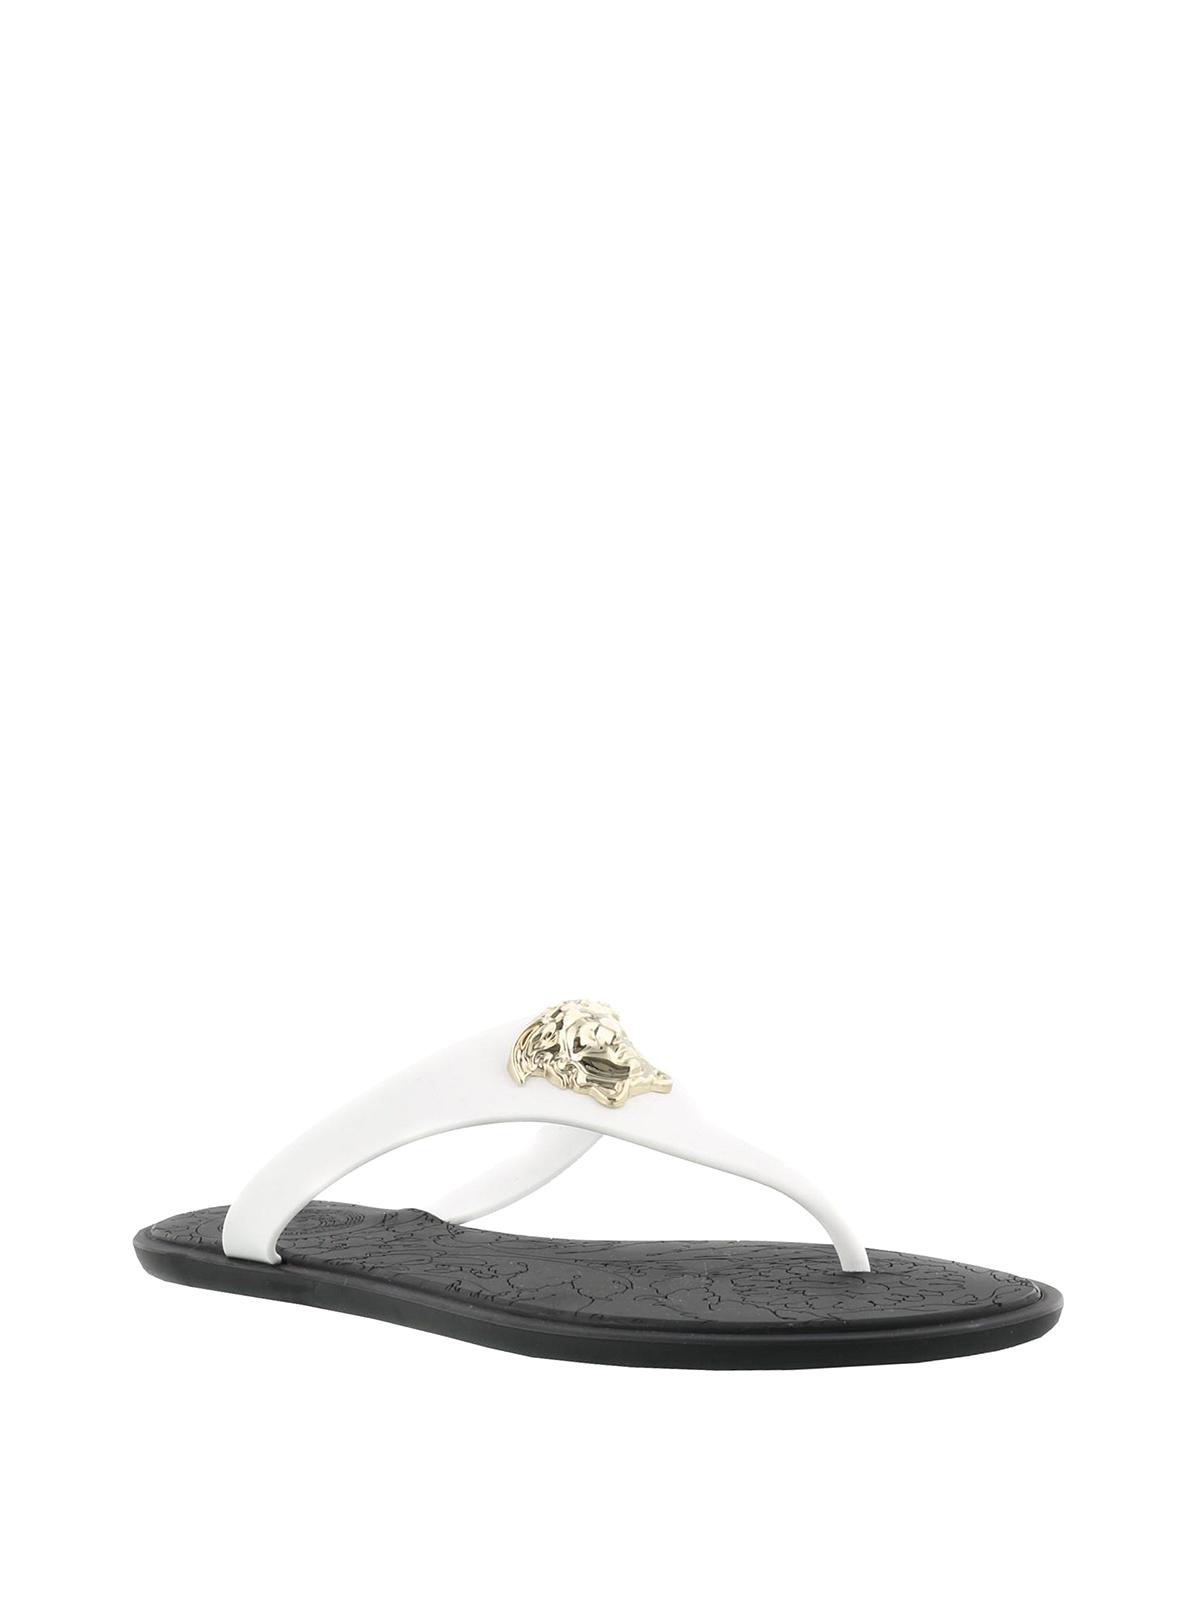 Versace - Medusa Palazzo thong sandals